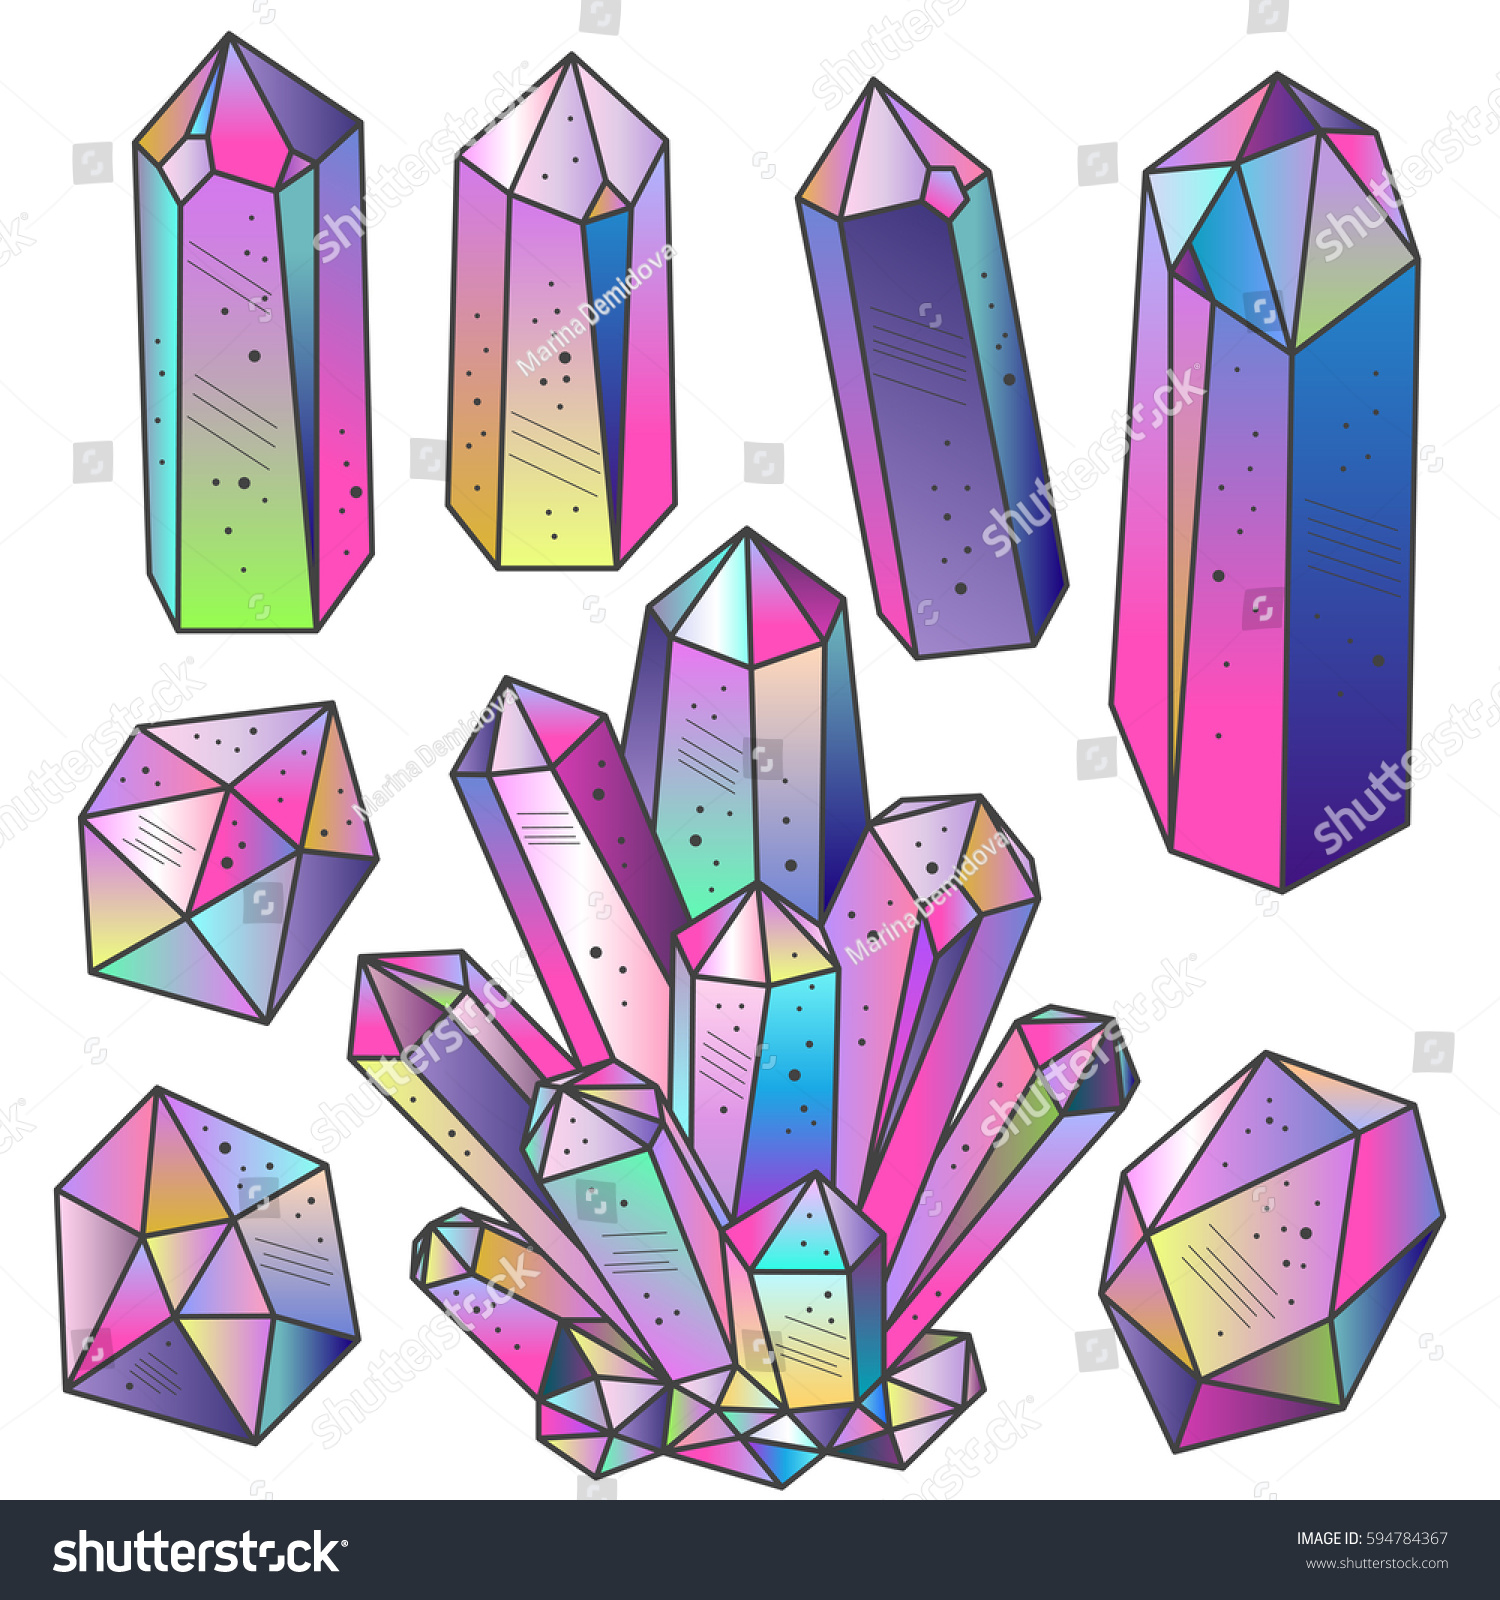 Crystal Gems Logo Icon: Magic Fairytale Crystals Sketch Hand Drawn Stock Vector